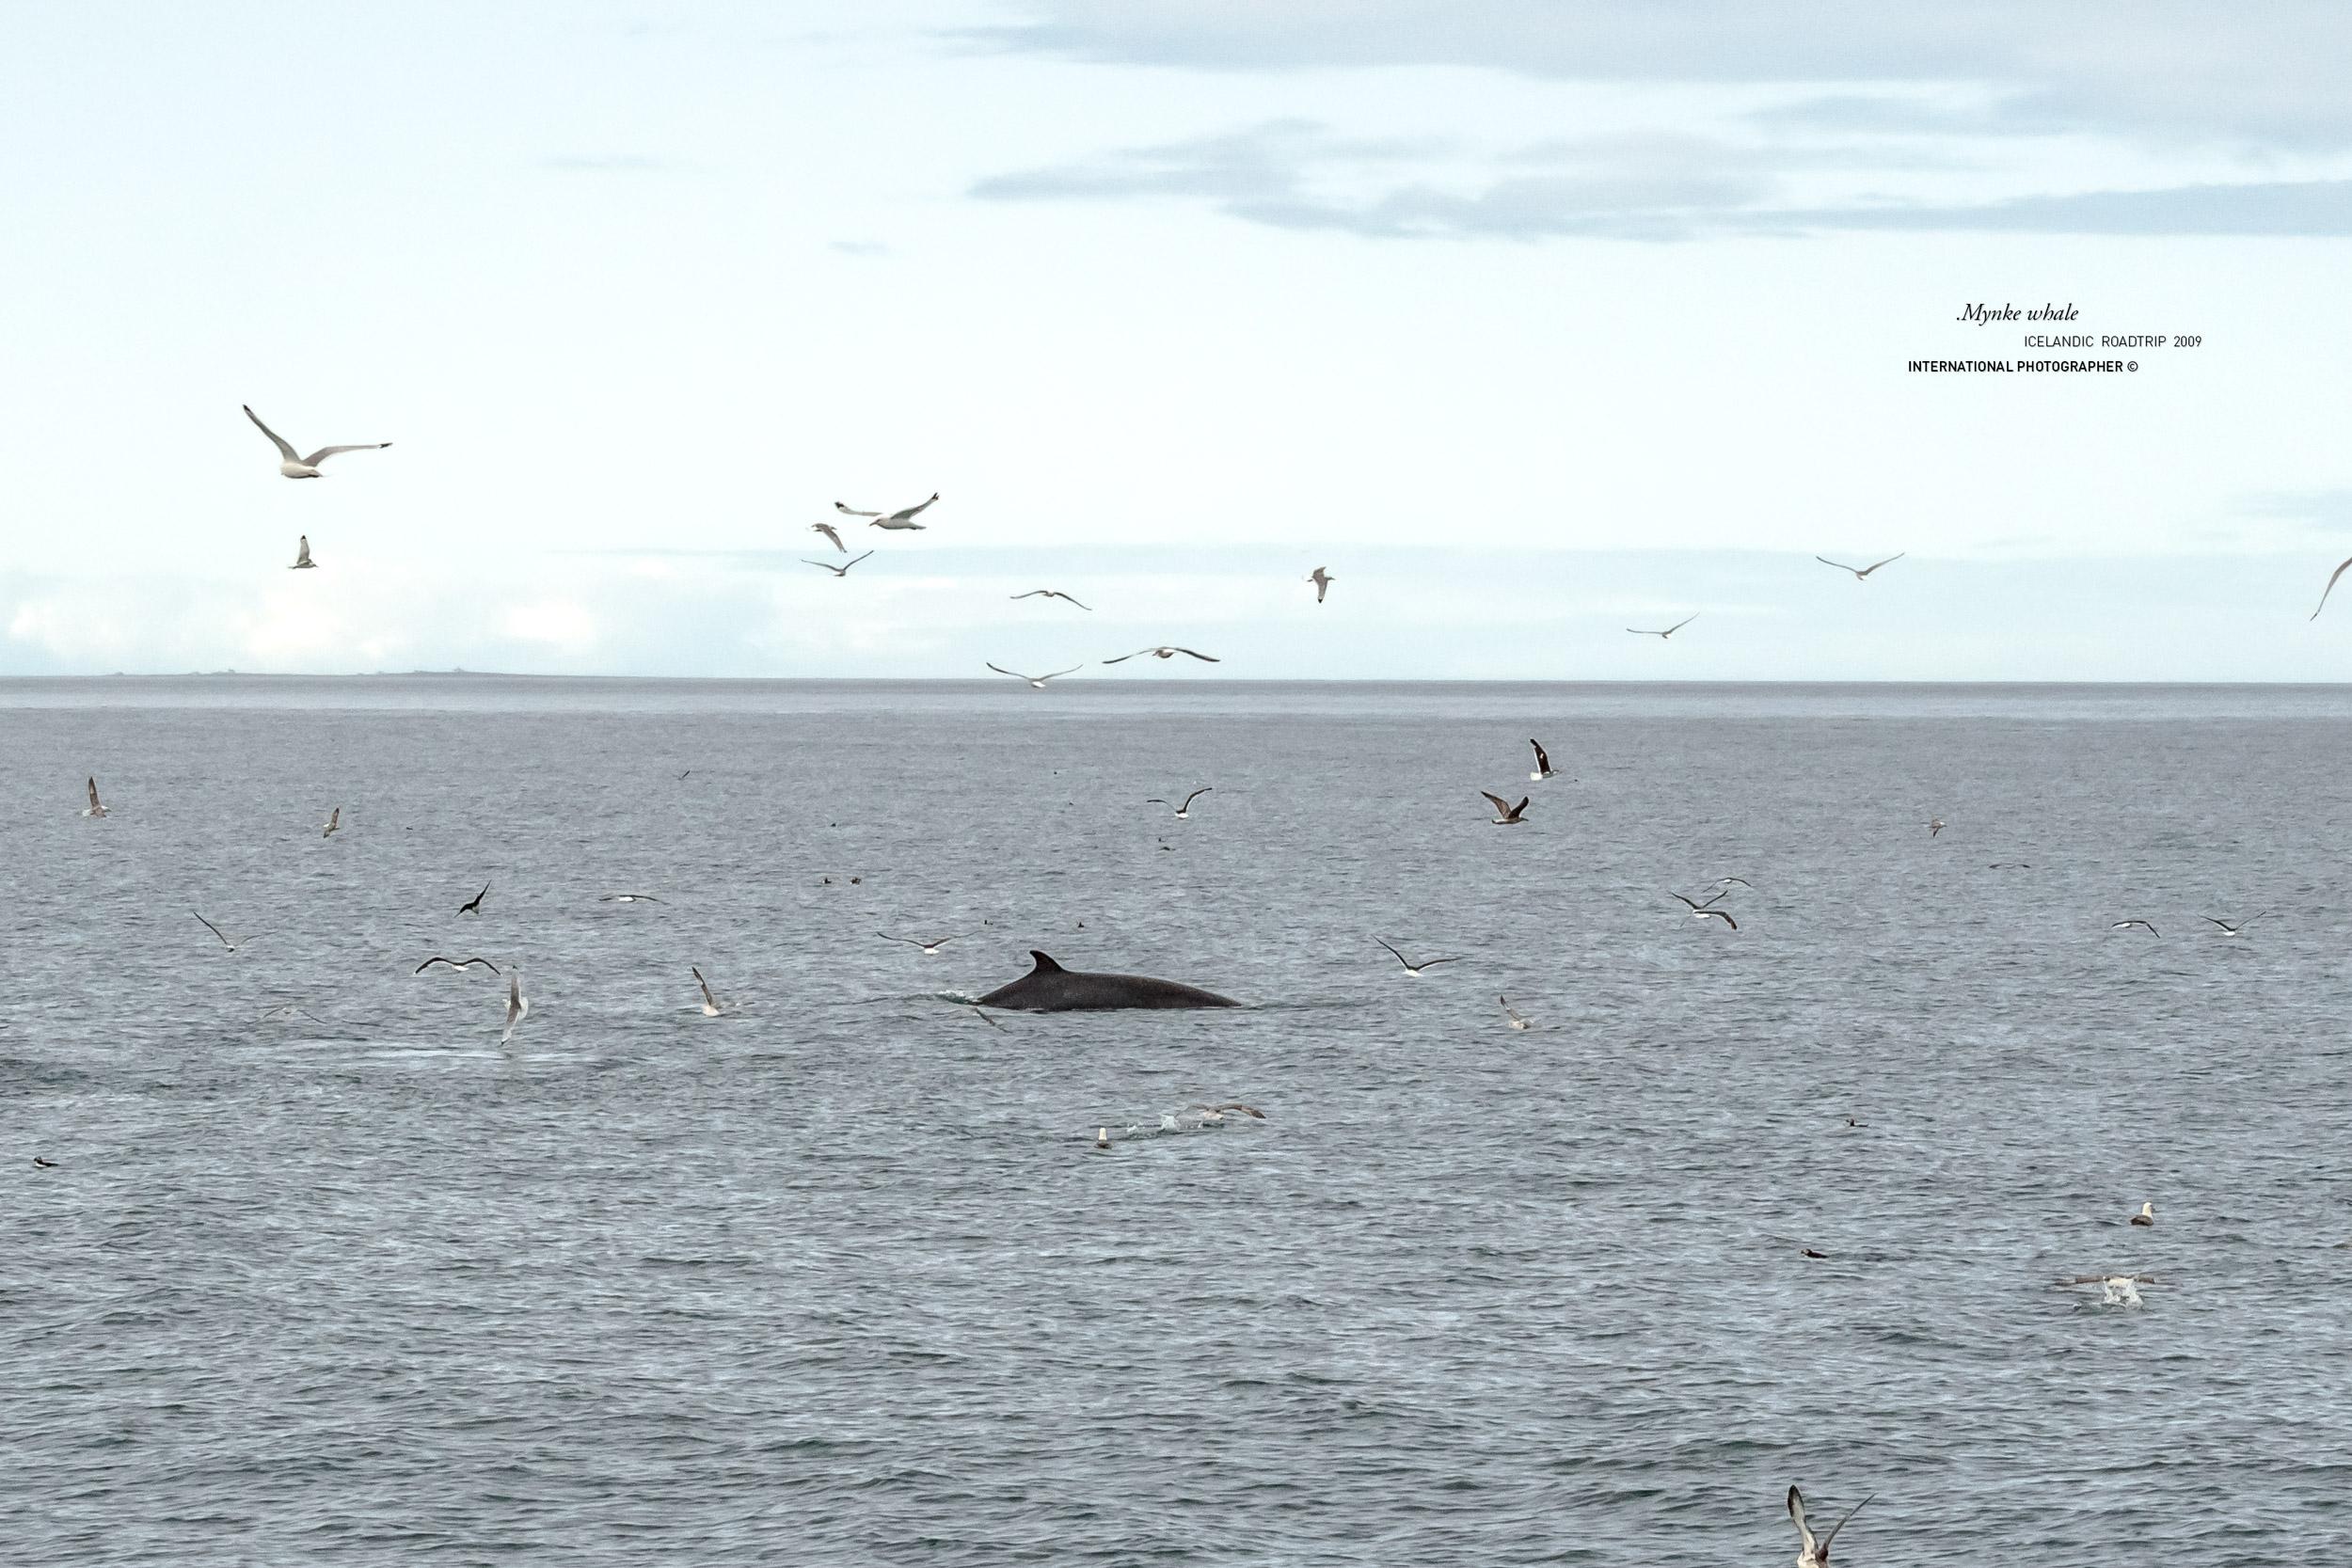 Une baleine dans la baie d'Husavik